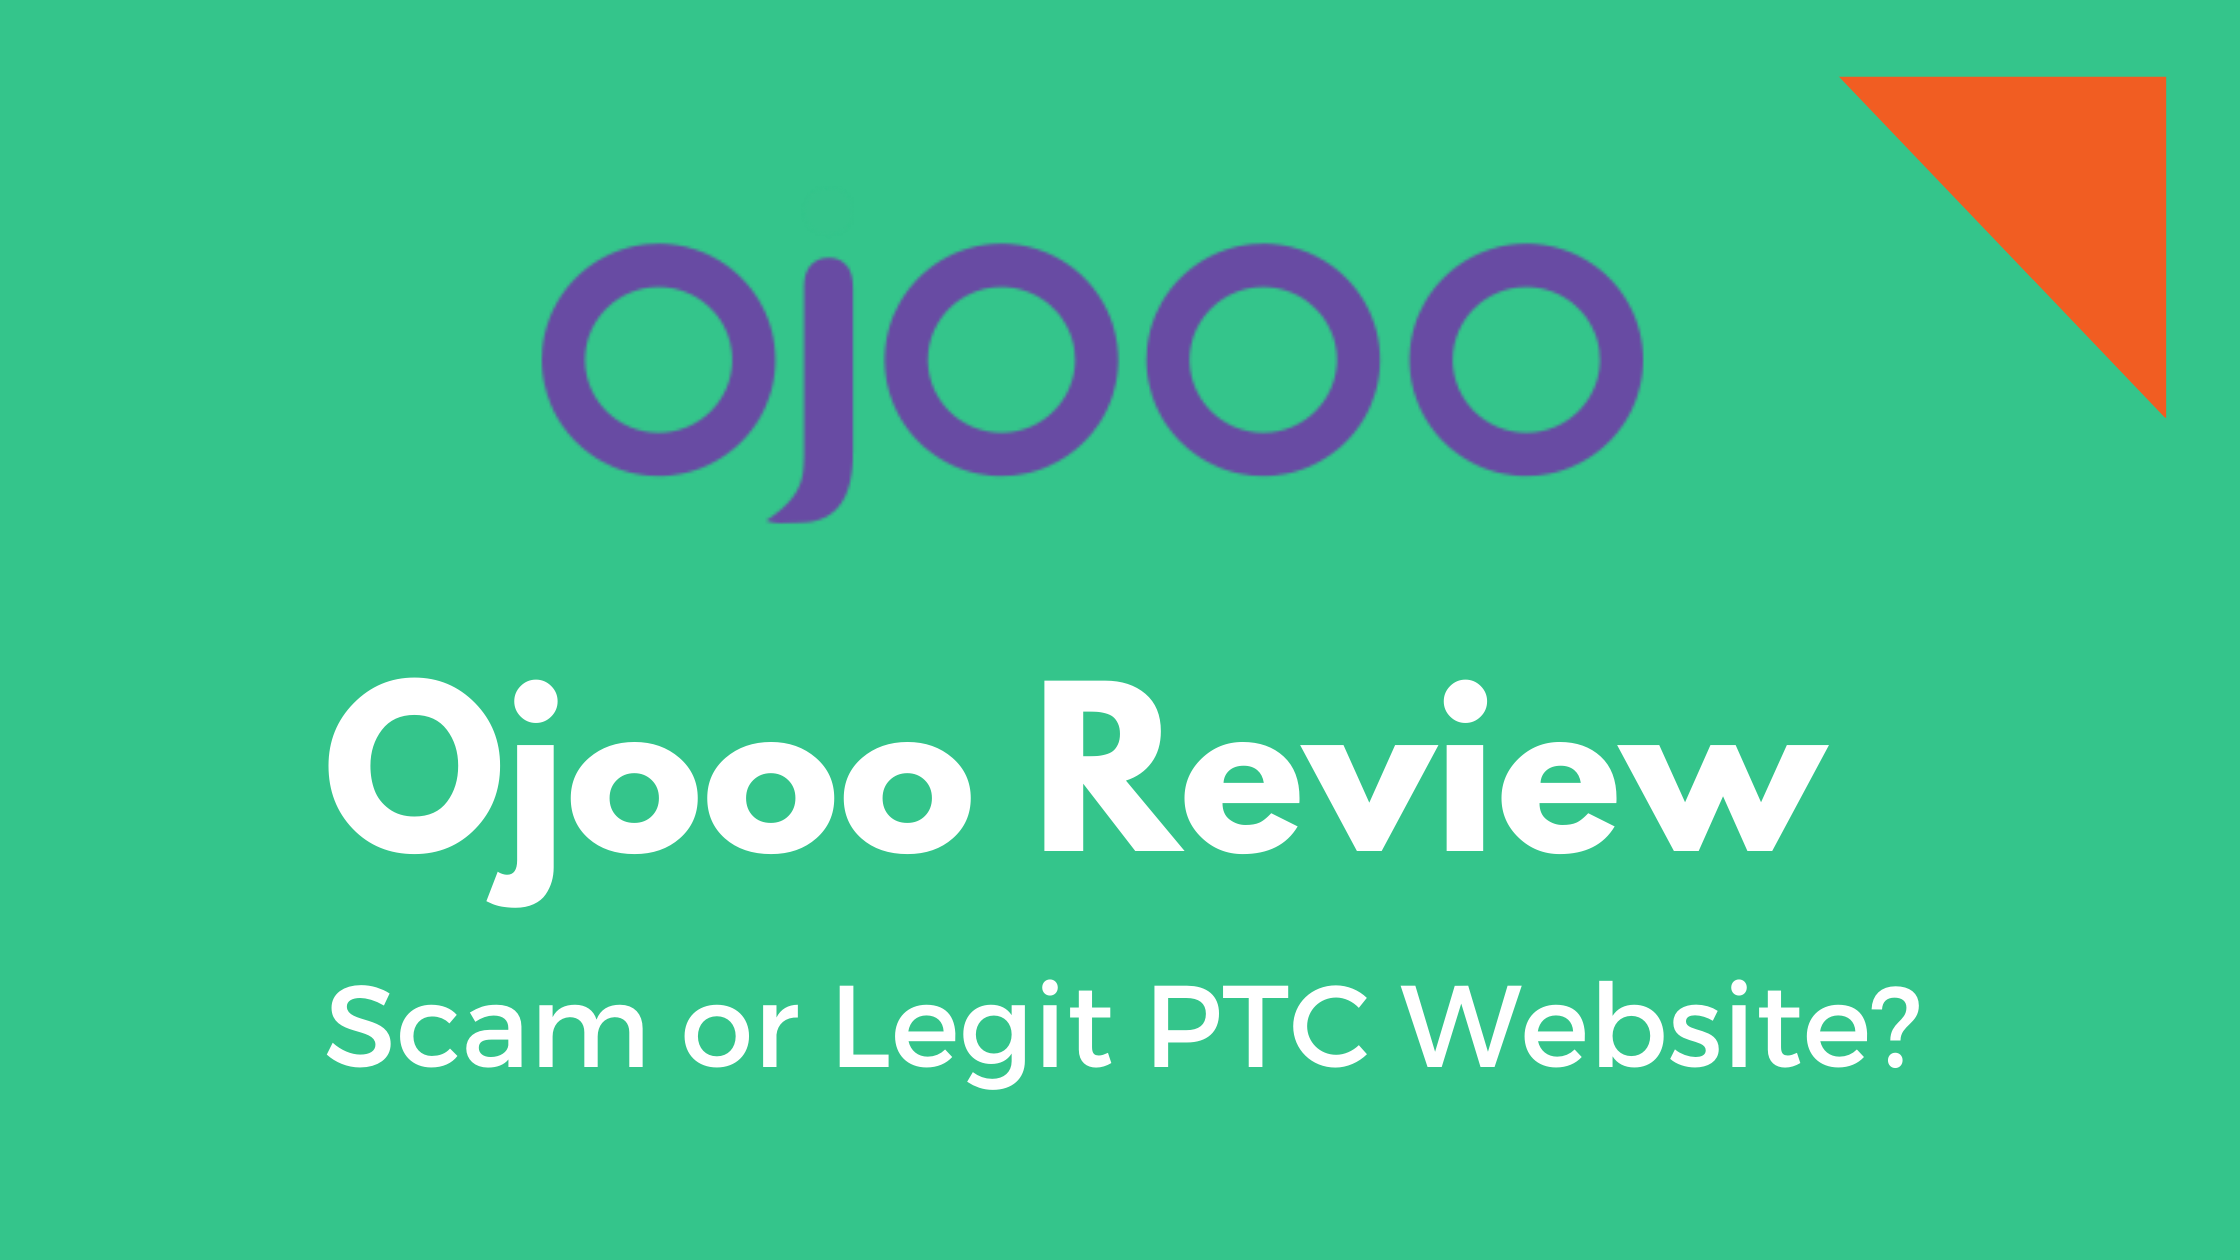 Ojooo WAD Reviews: Scam or Legit PTC Site